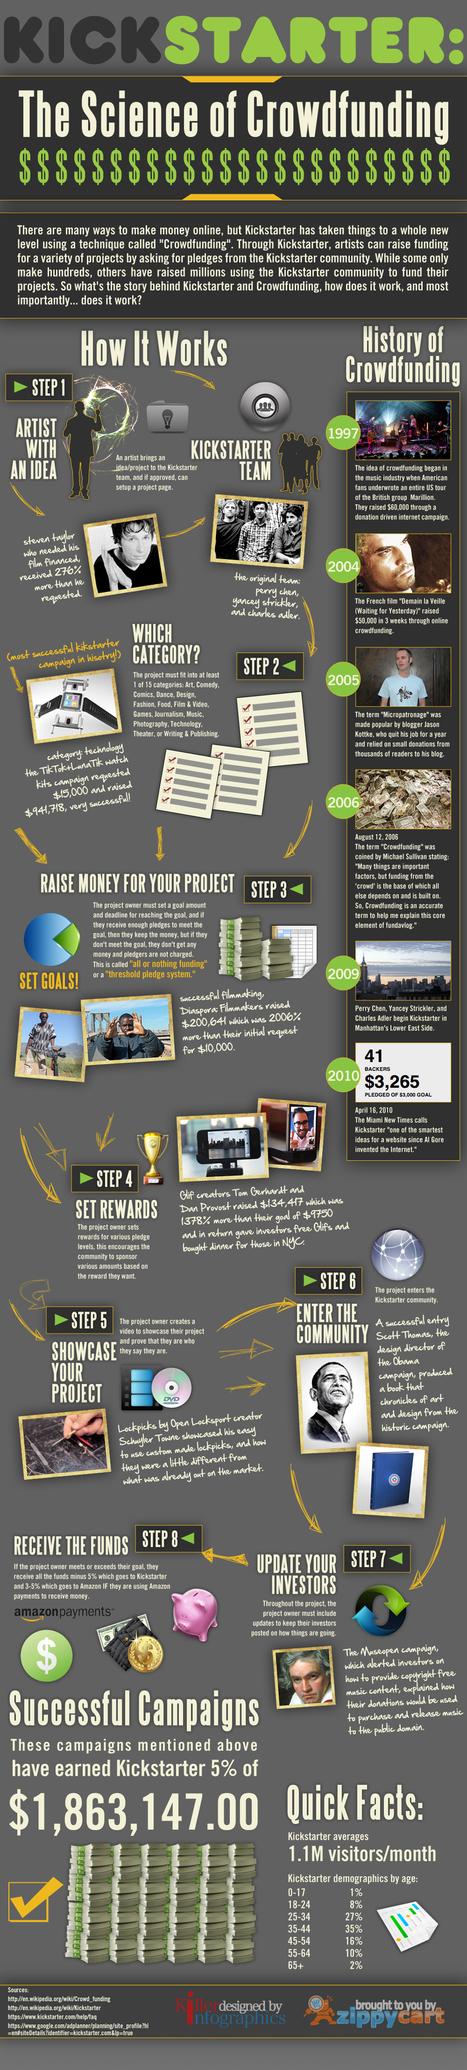 The Science of Crowdfunding | Kickstarter Infographic | Crowdfunding World | Scoop.it